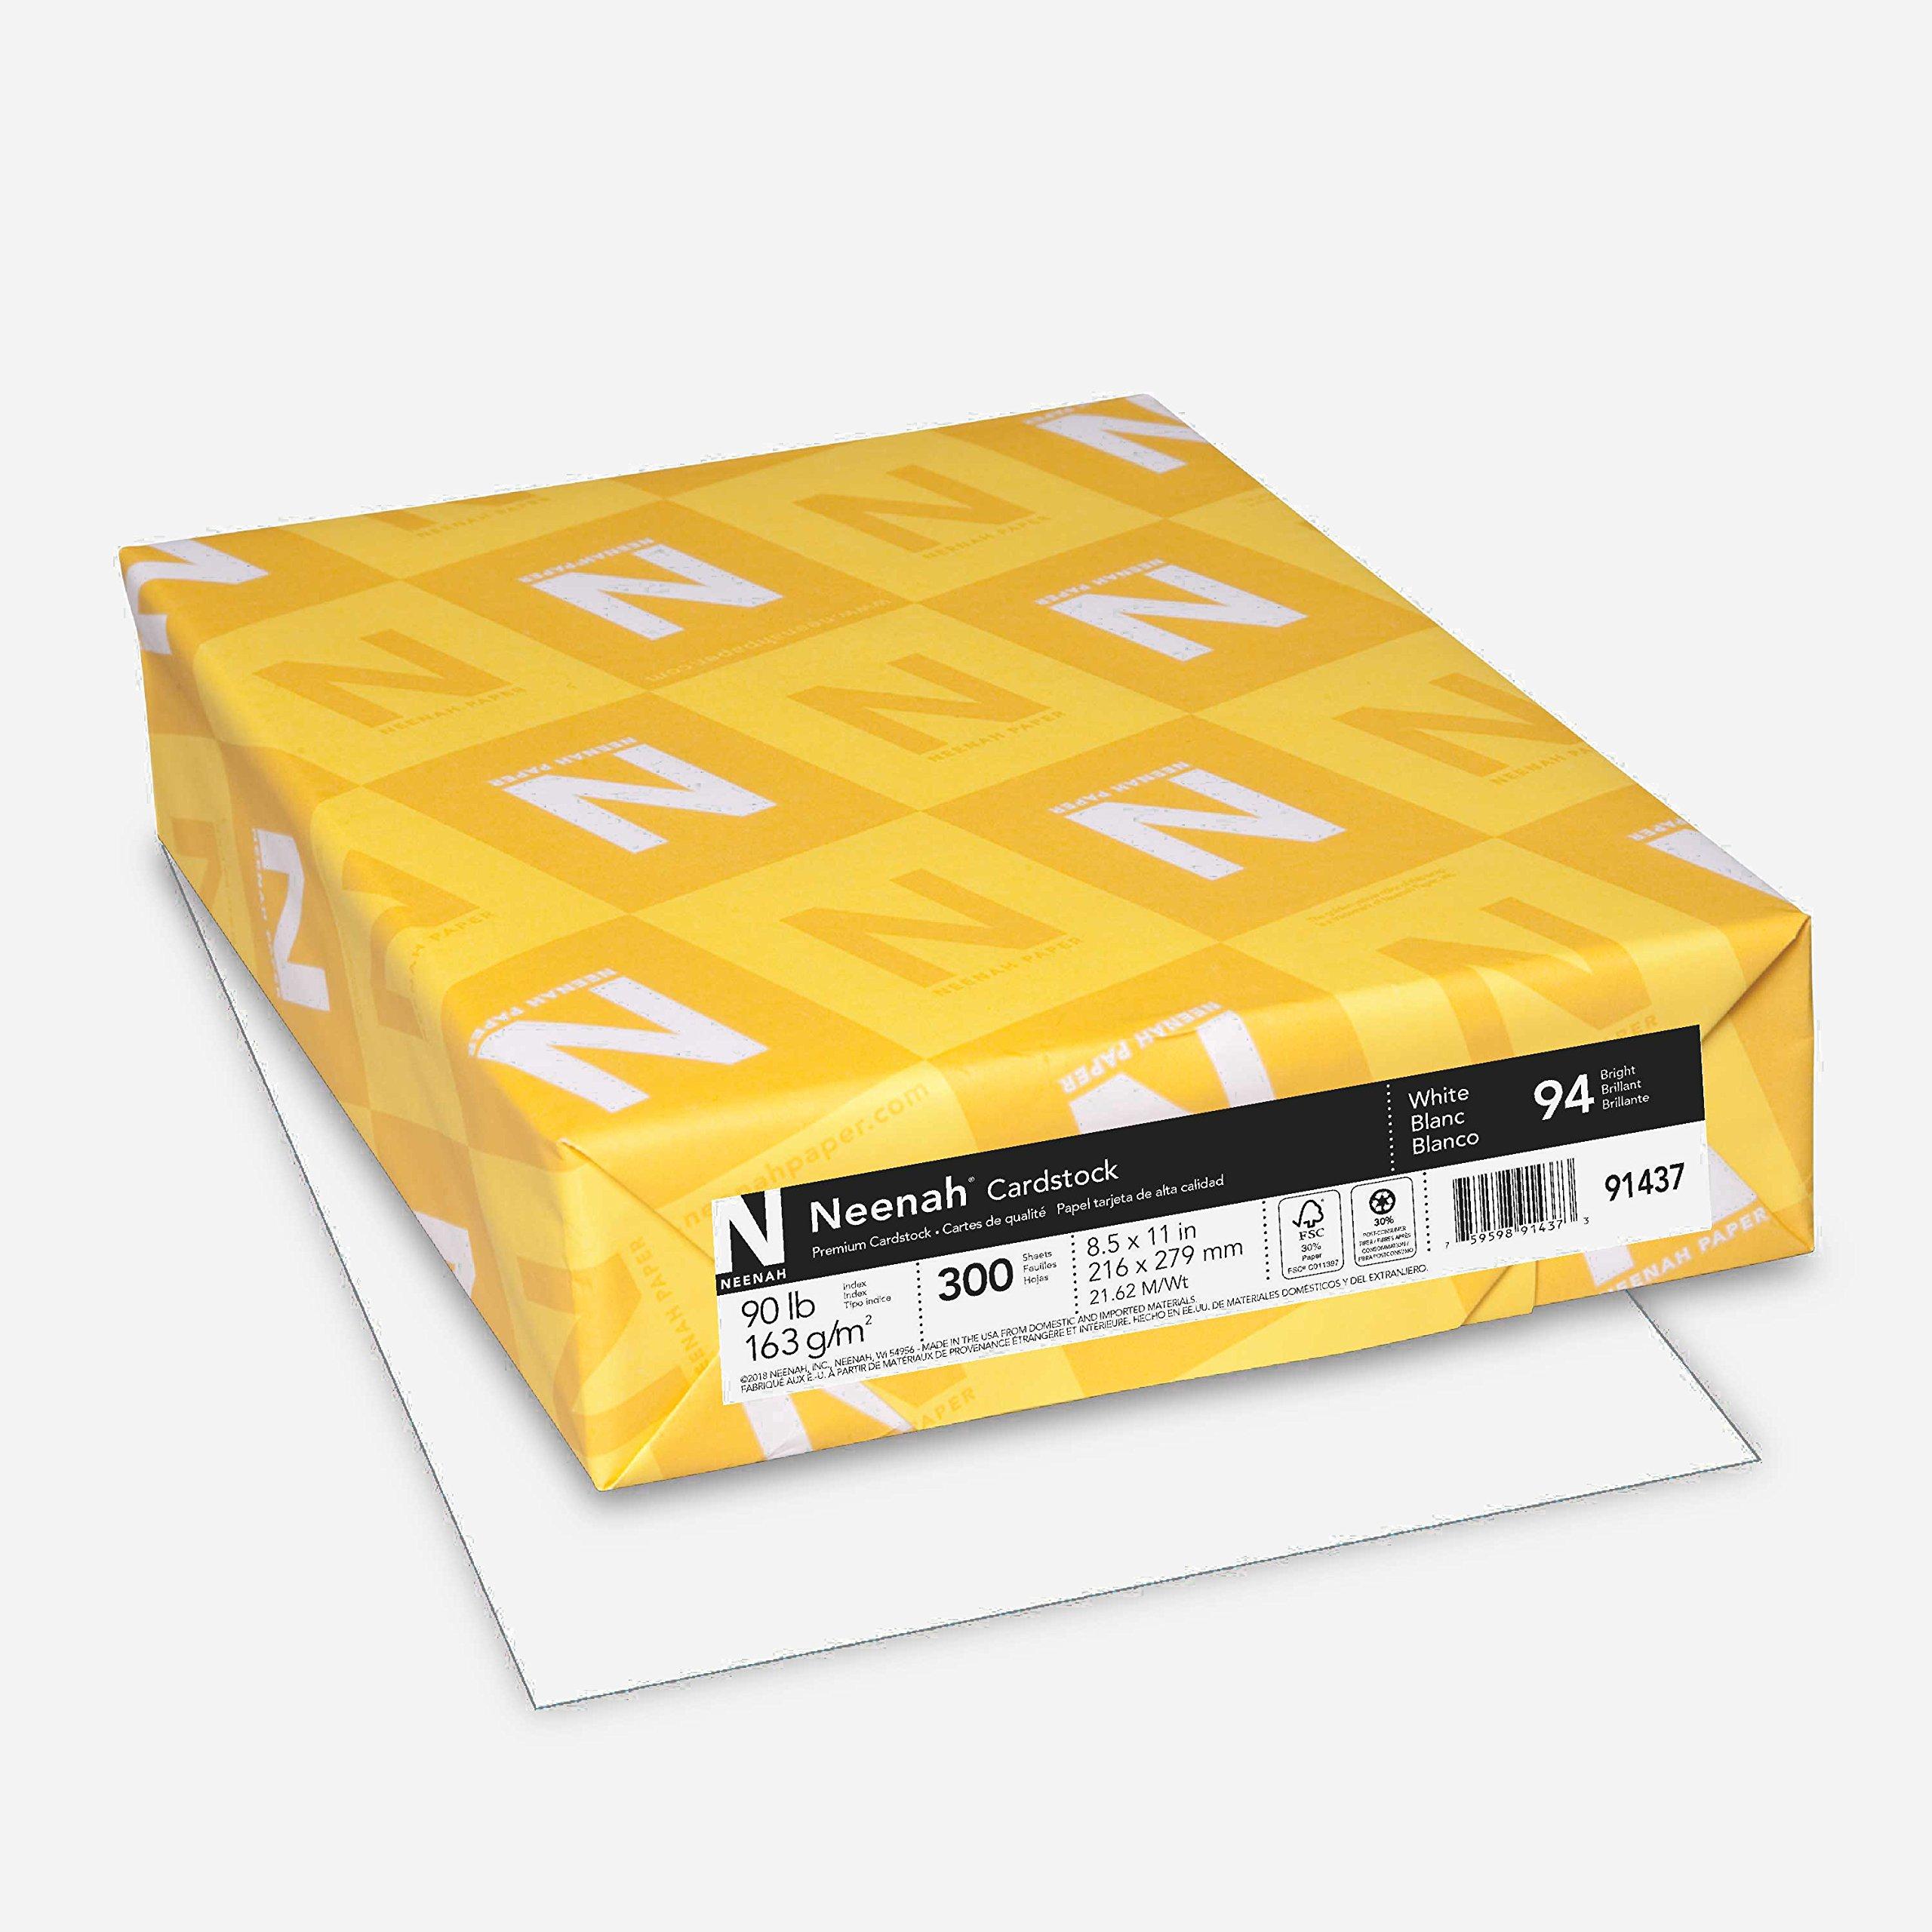 Neenah Cardstock, 8.5''x11'', Heavy-Weight, White, 94 Brightness, 300 Sheets (91437)